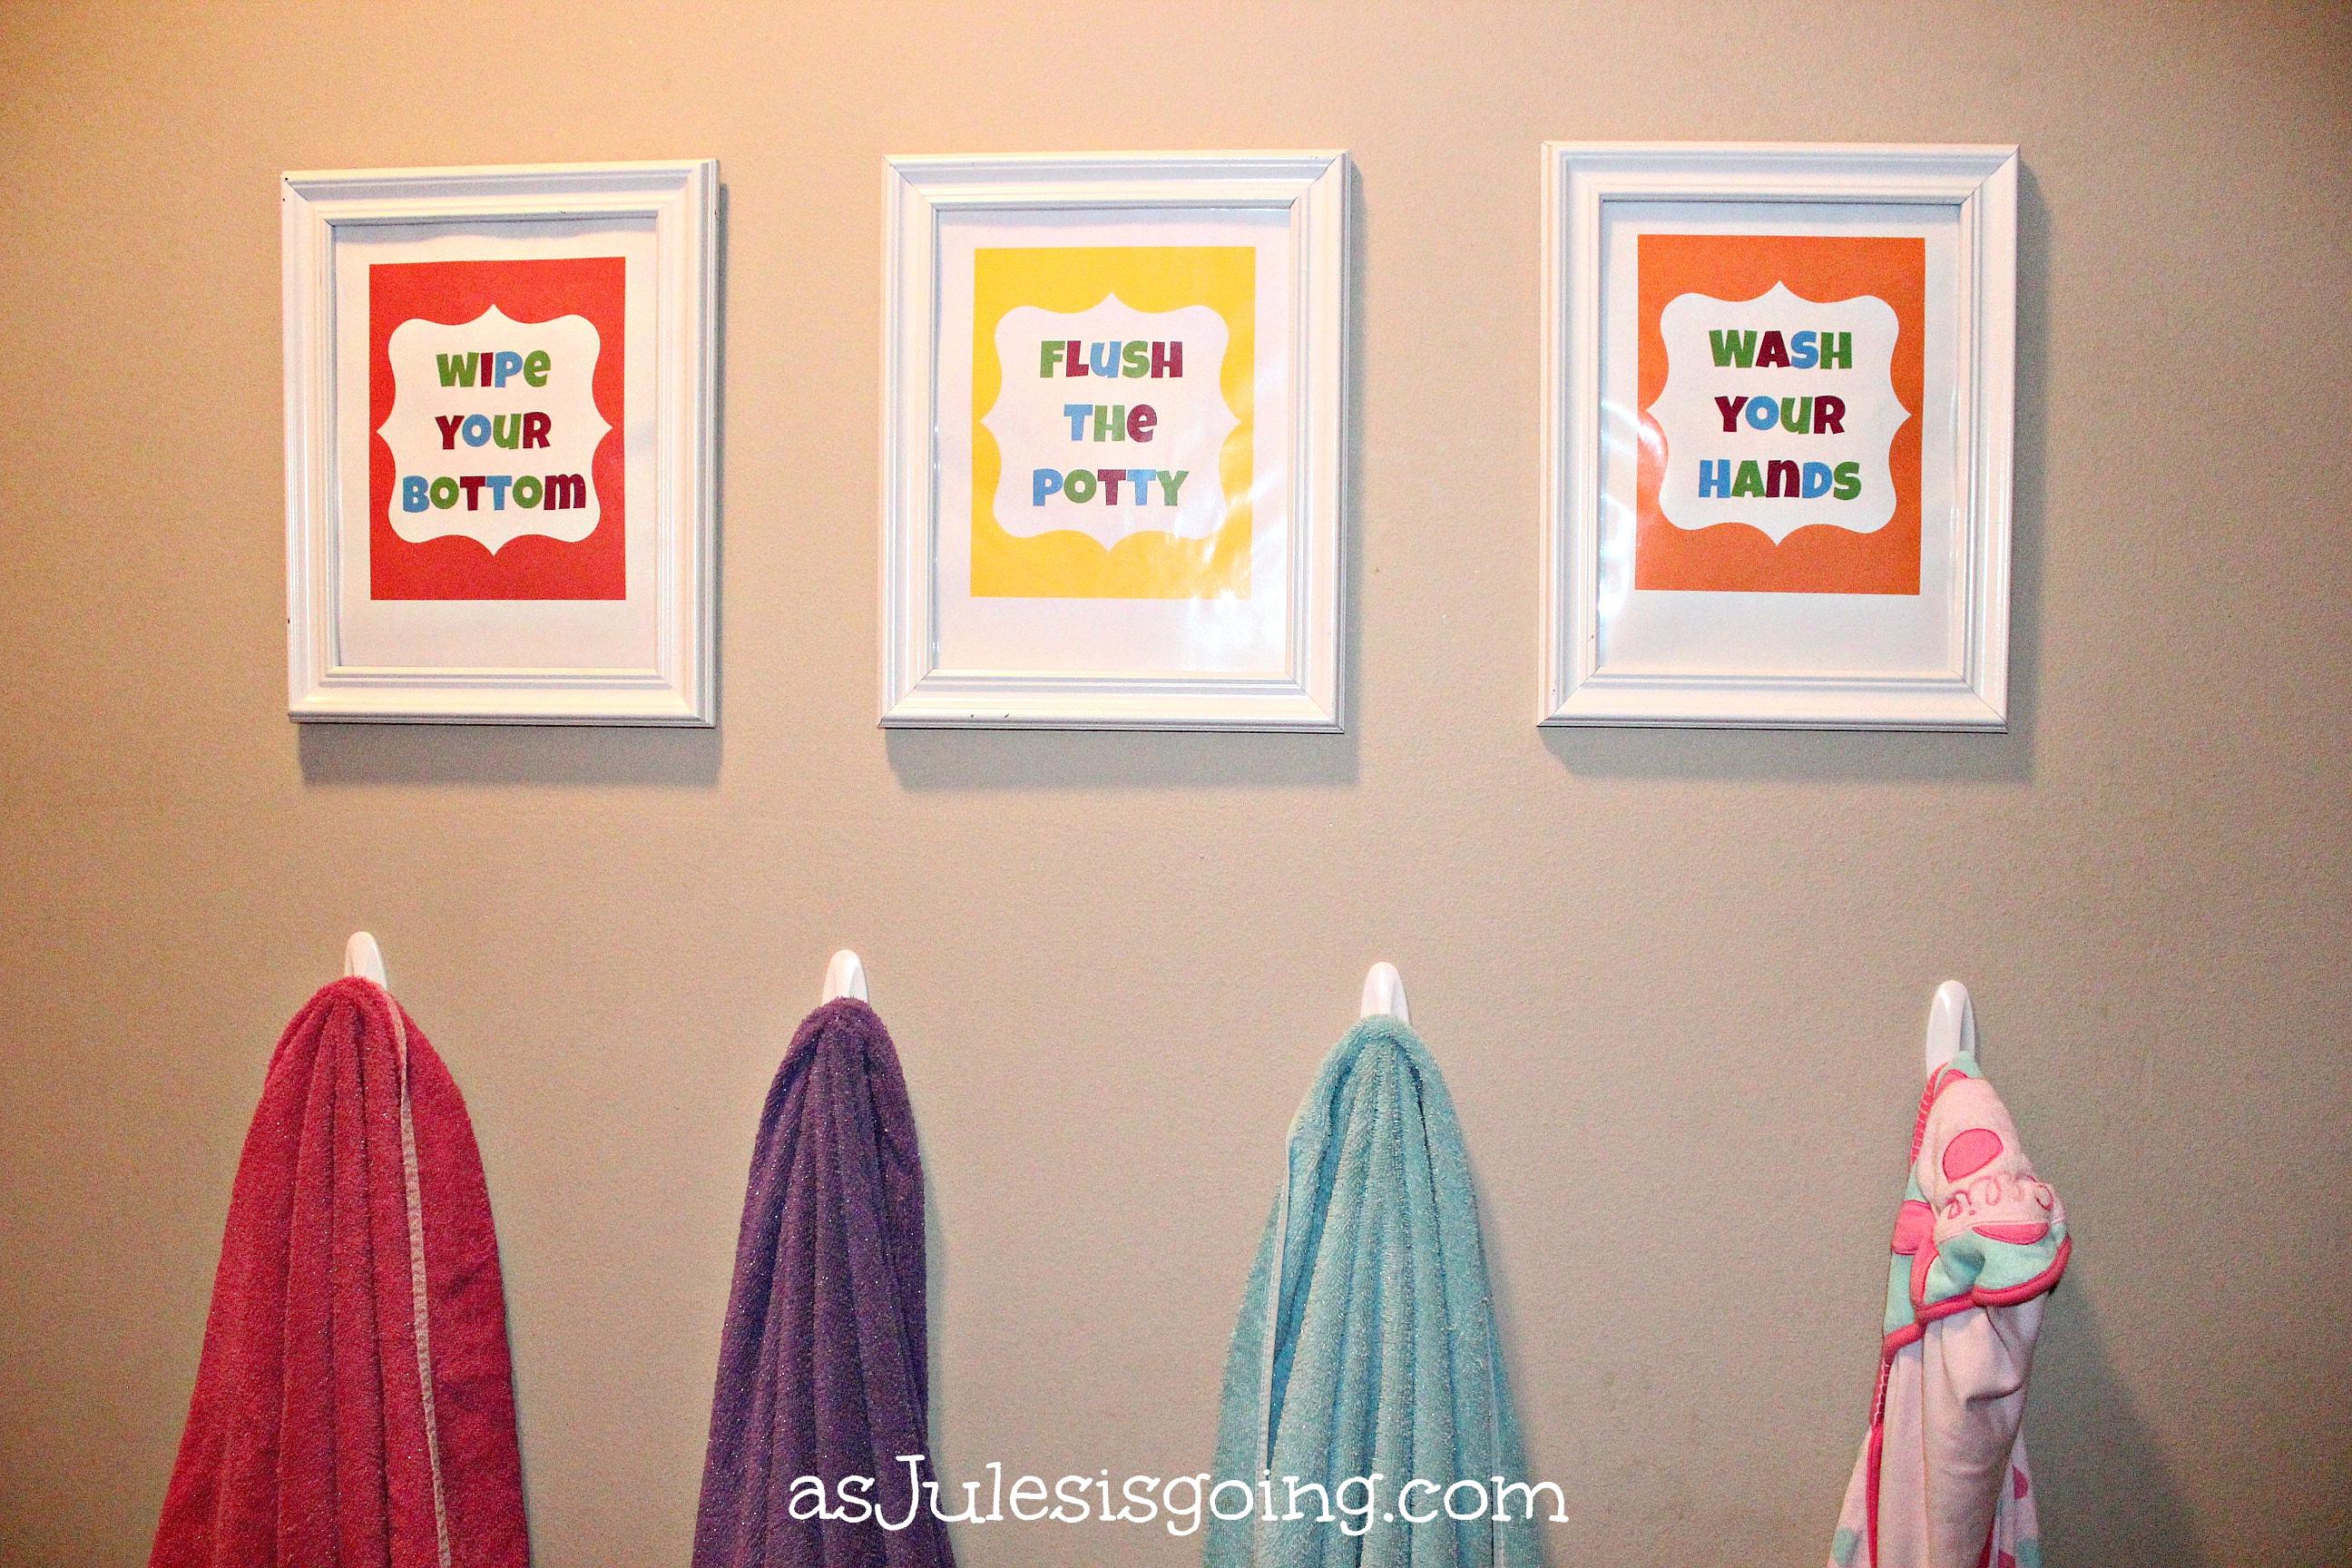 Kidsu0027 Bathroom ArtSigns Wipe Your Bottom, Flush The Potty, Wash Part 59